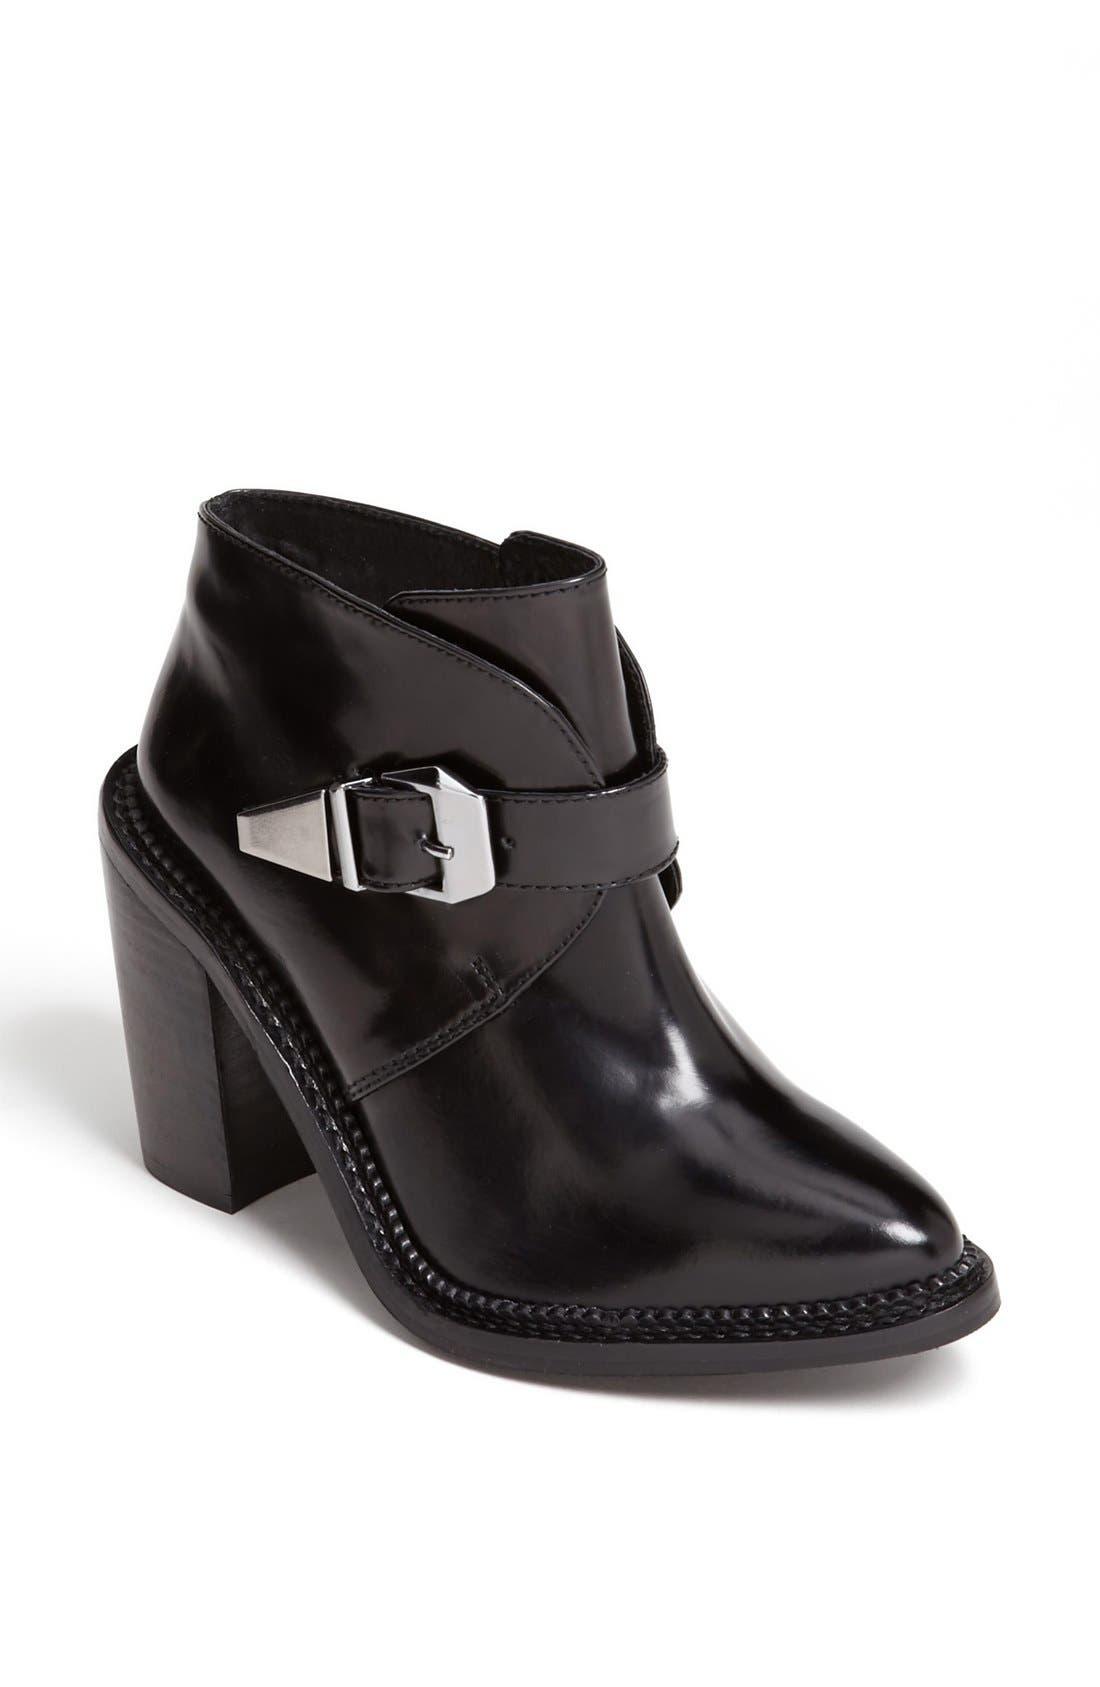 Alternate Image 1 Selected - Topshop 'Aleta' Monk Strap Boot